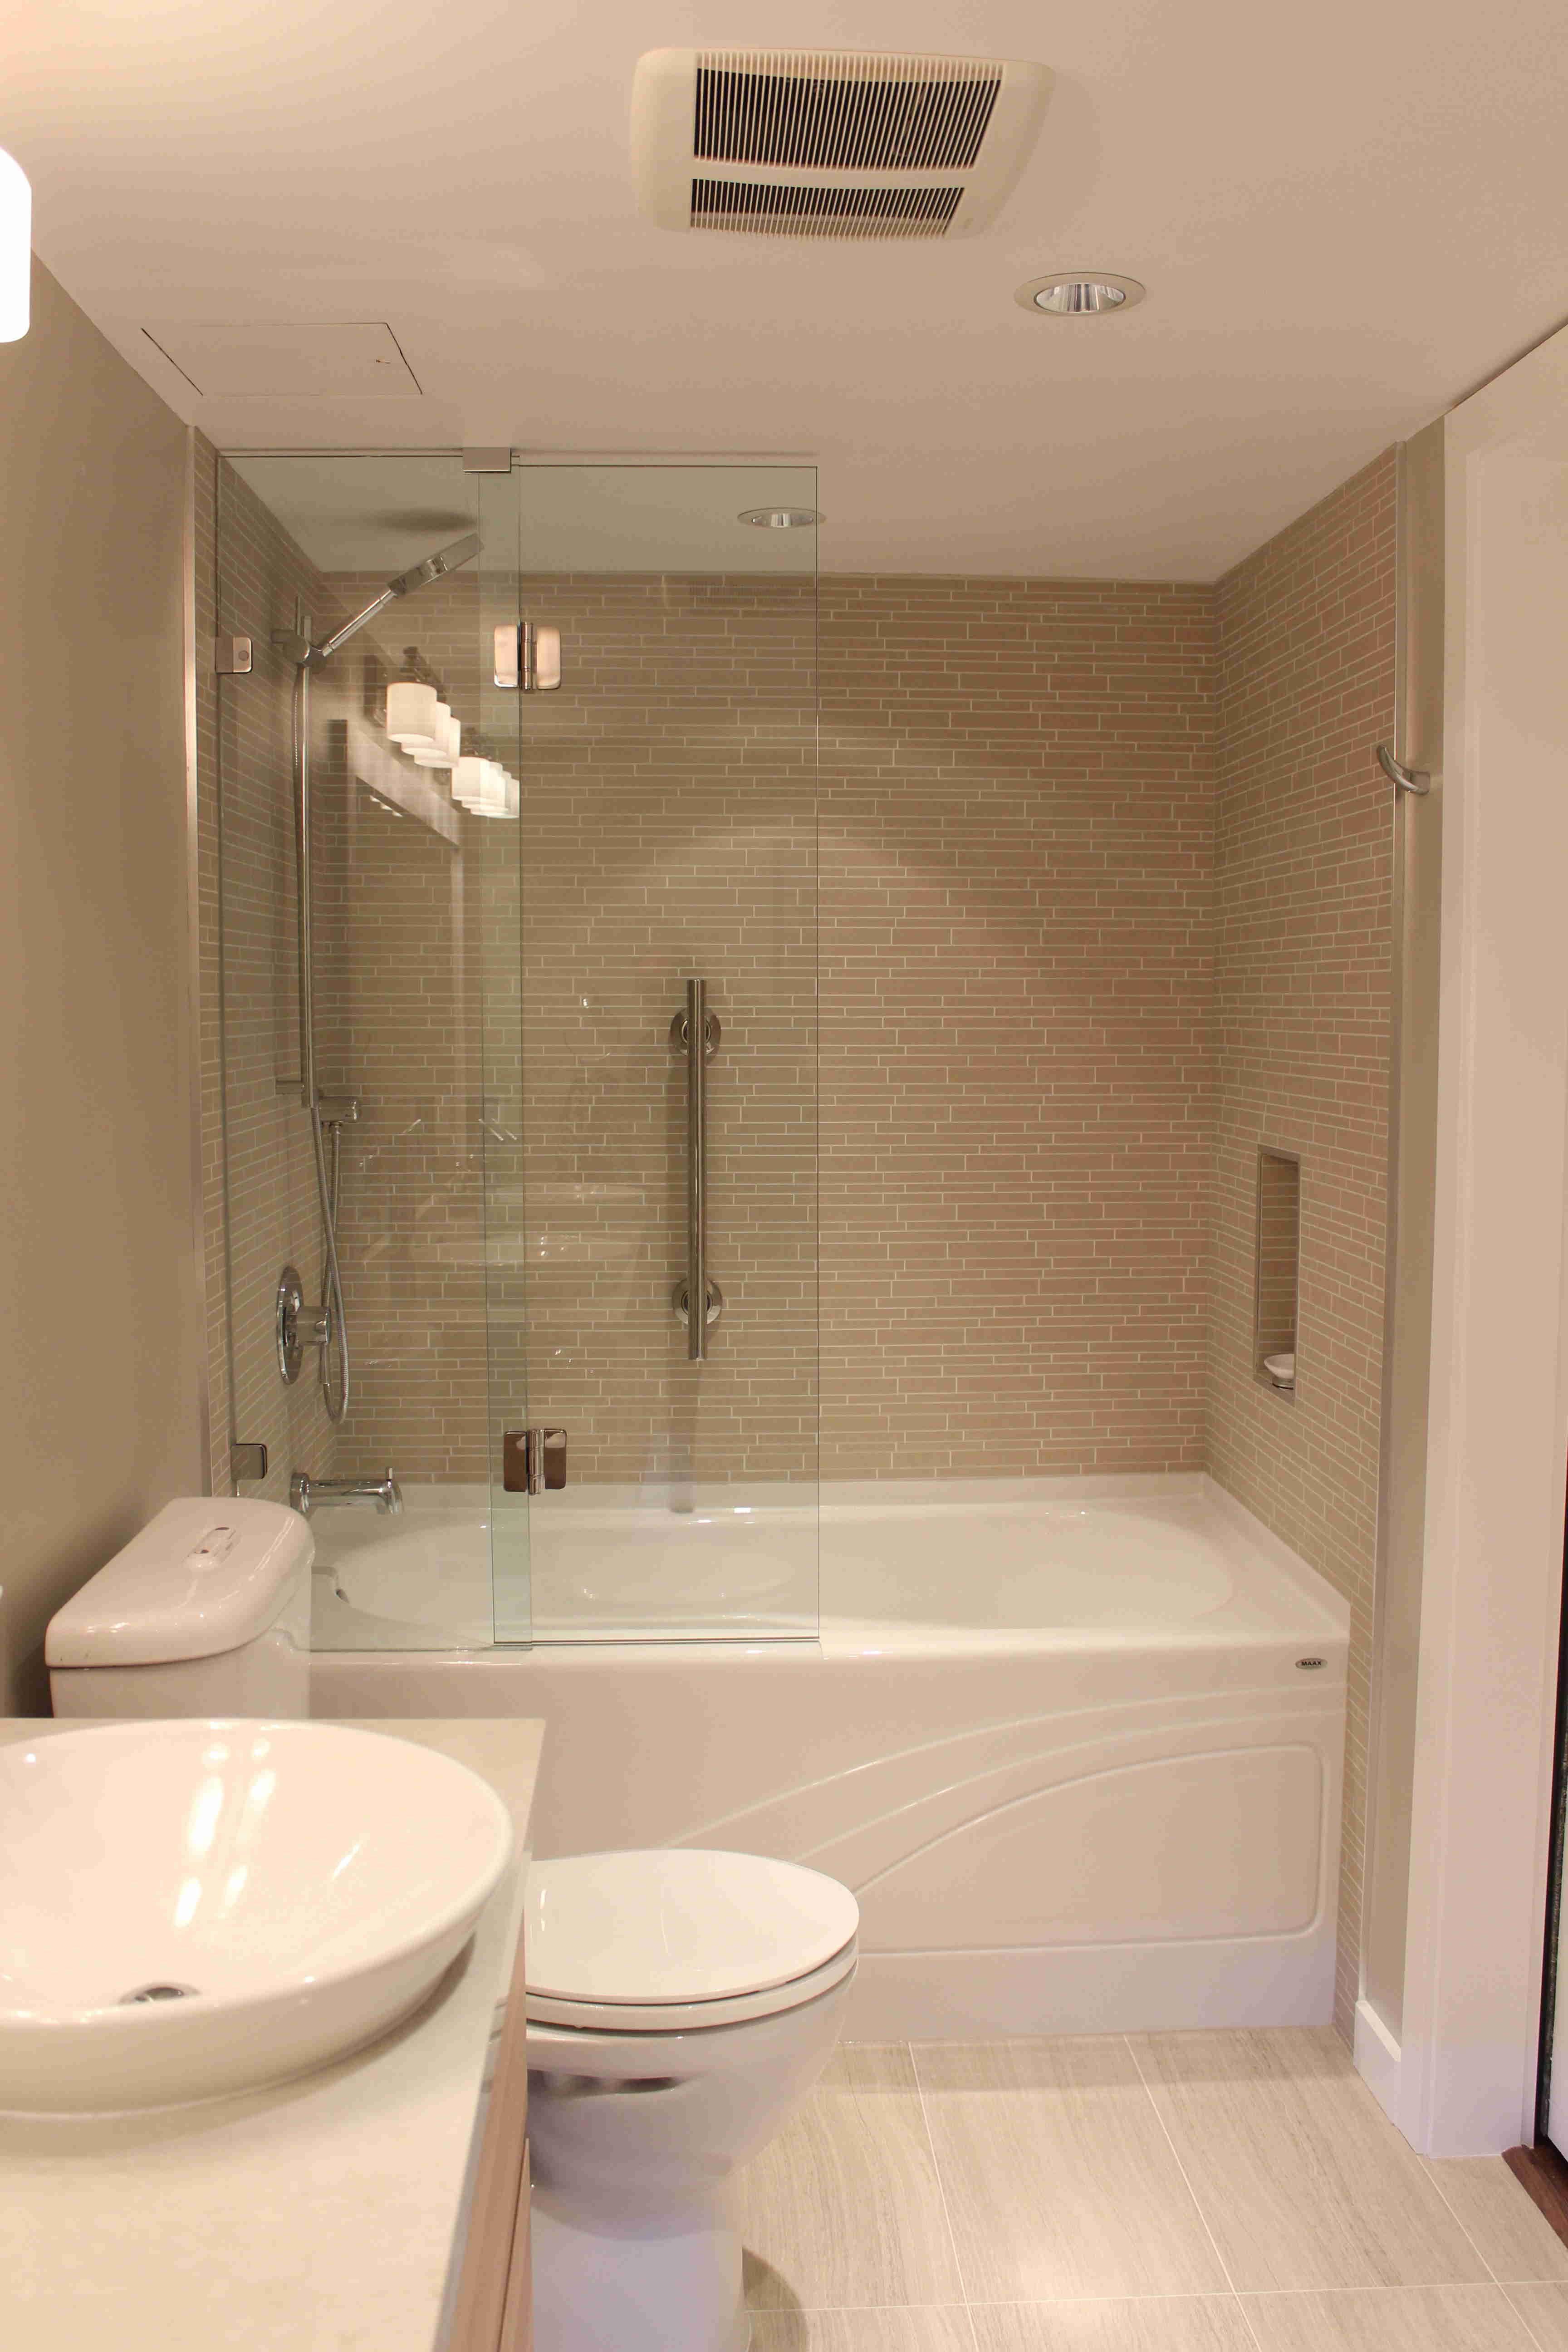 Breathtaking Bathrooms Design Pin by andin On Home Design Decor Interior